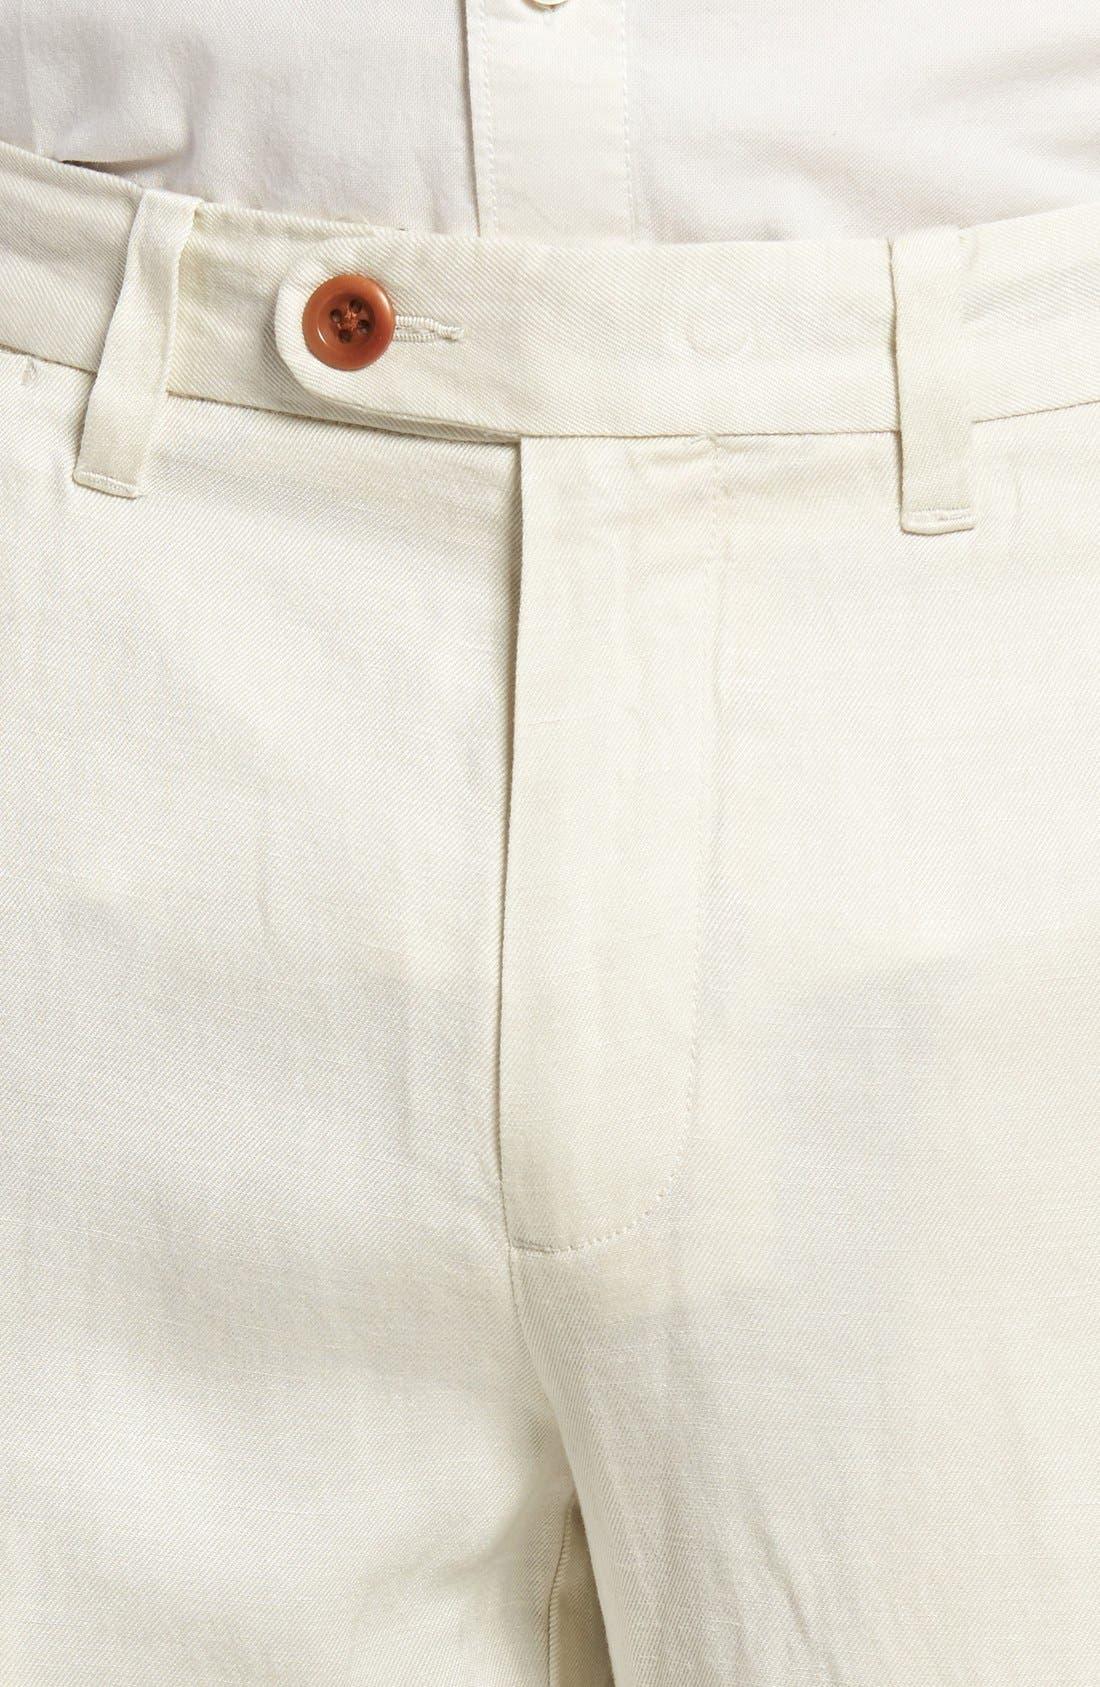 'La Jolla' Flat Front Pants,                             Alternate thumbnail 8, color,                             250